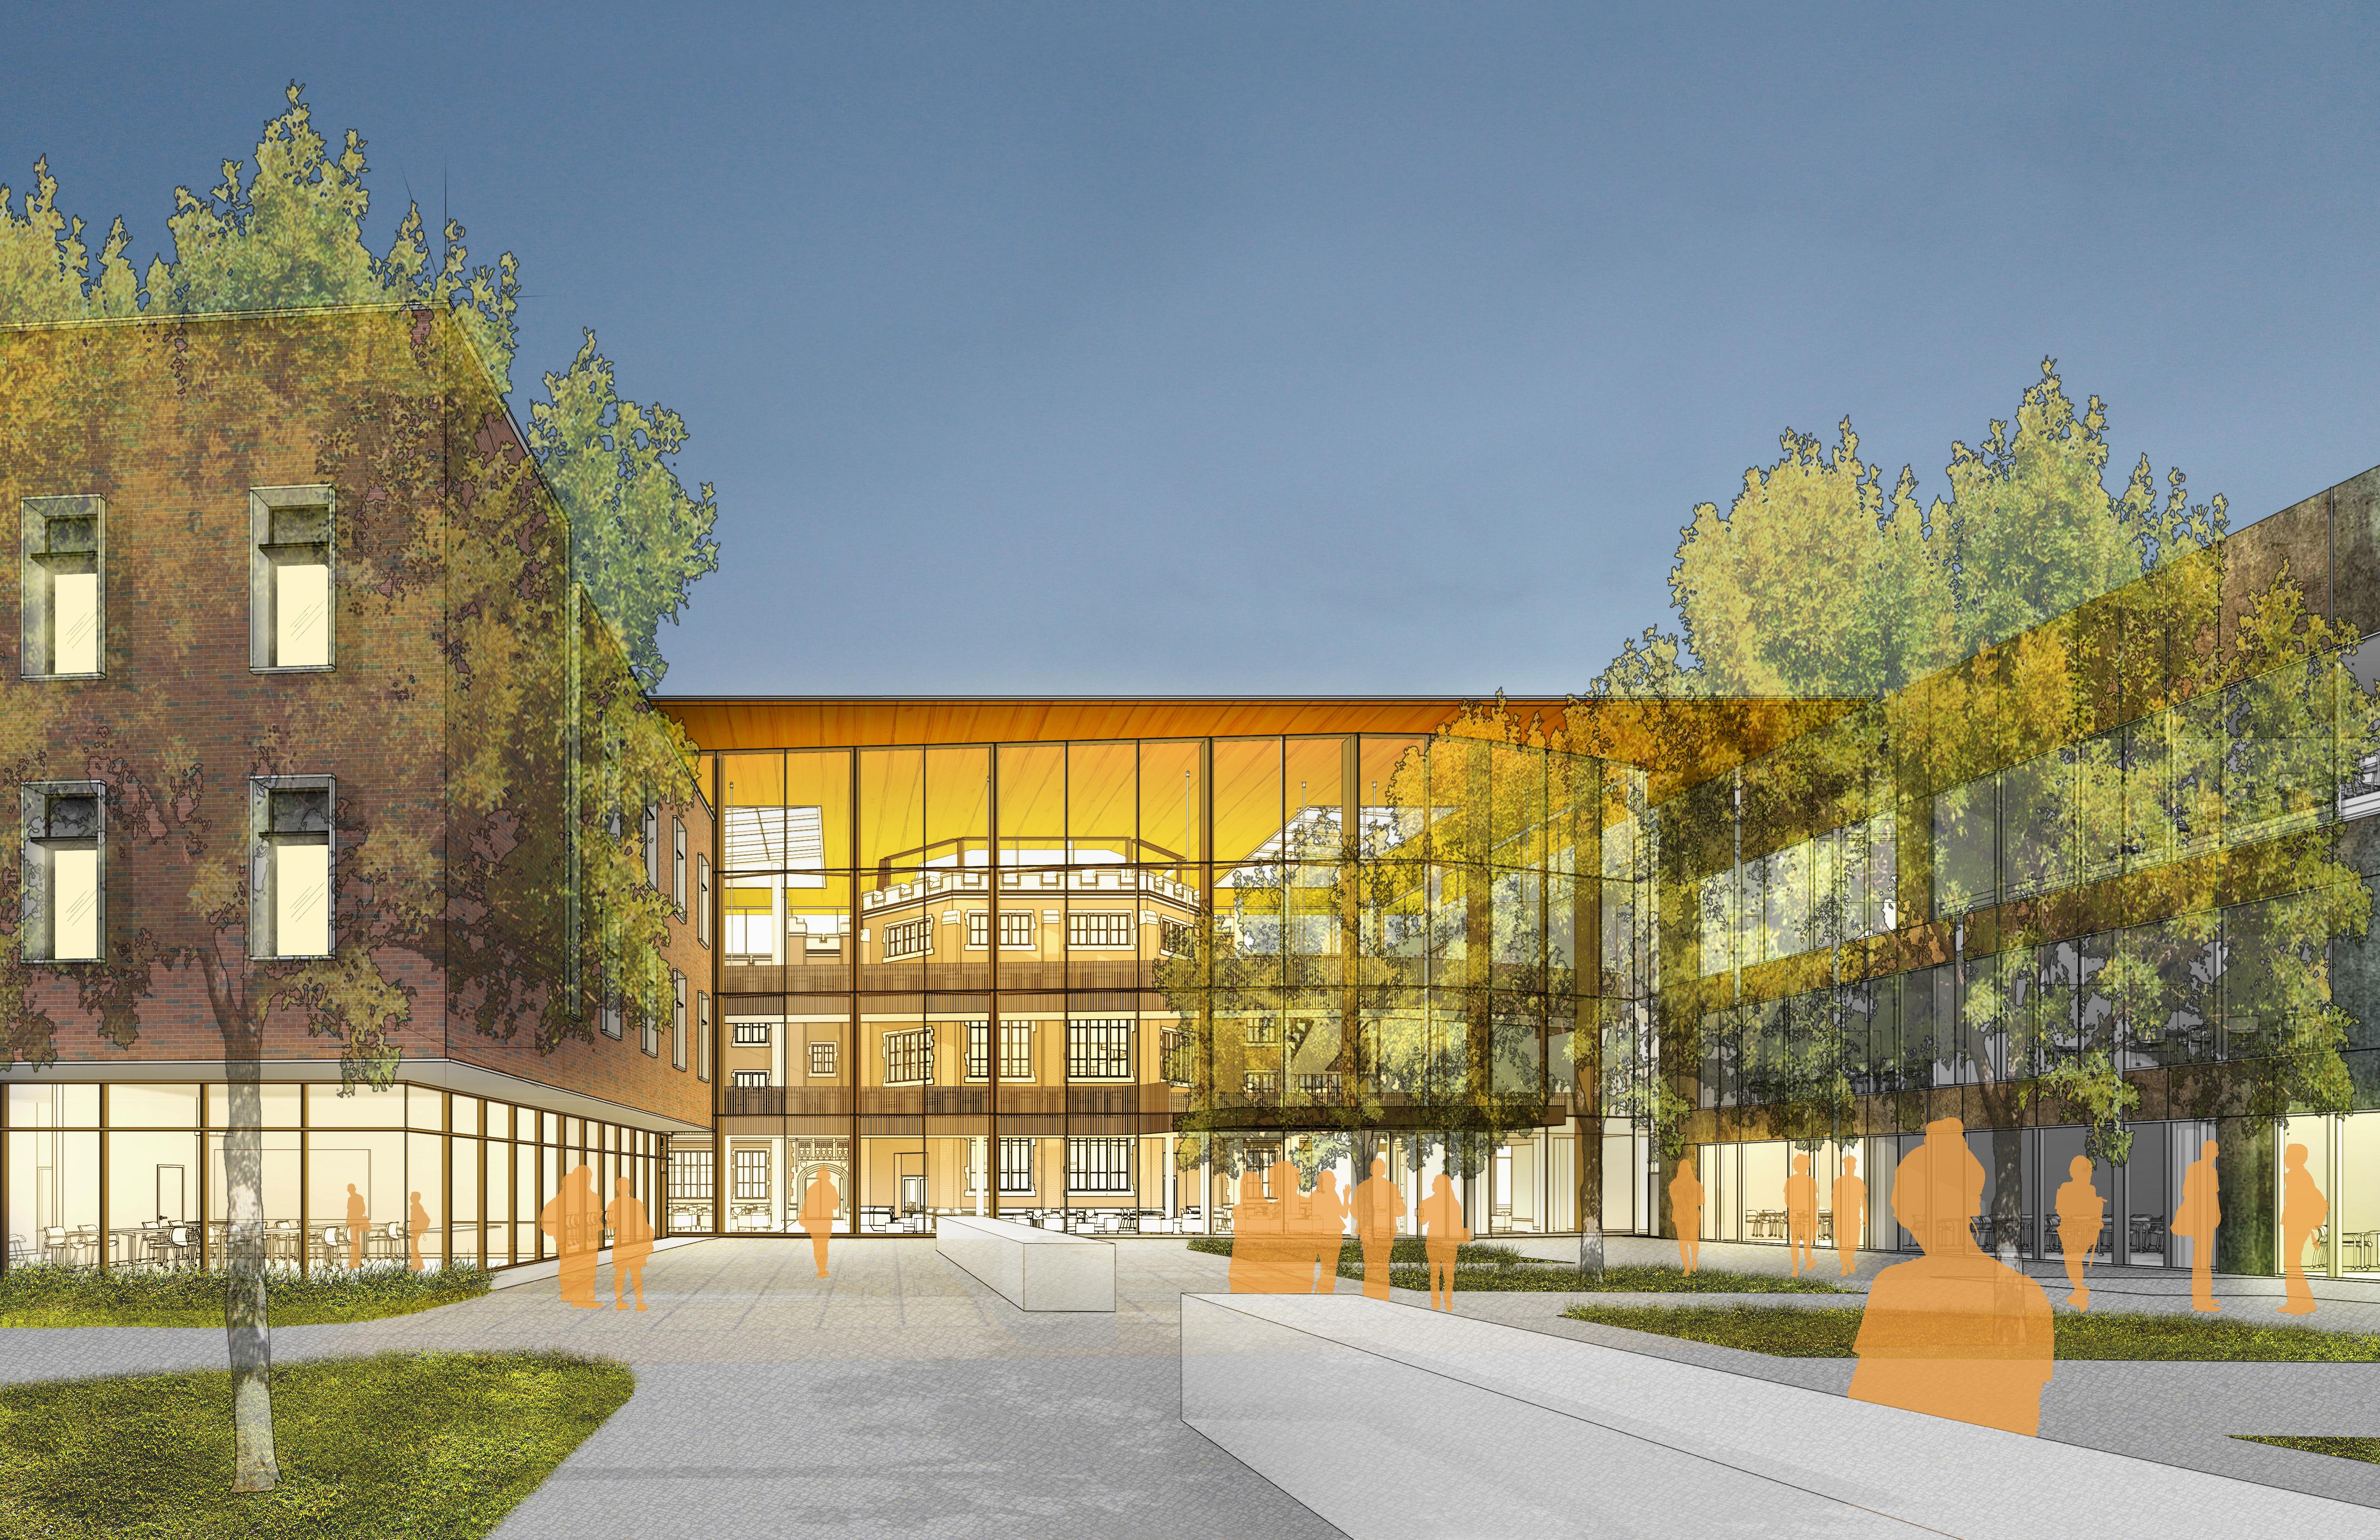 Concept rendering of entrance to HSSC glass atrium